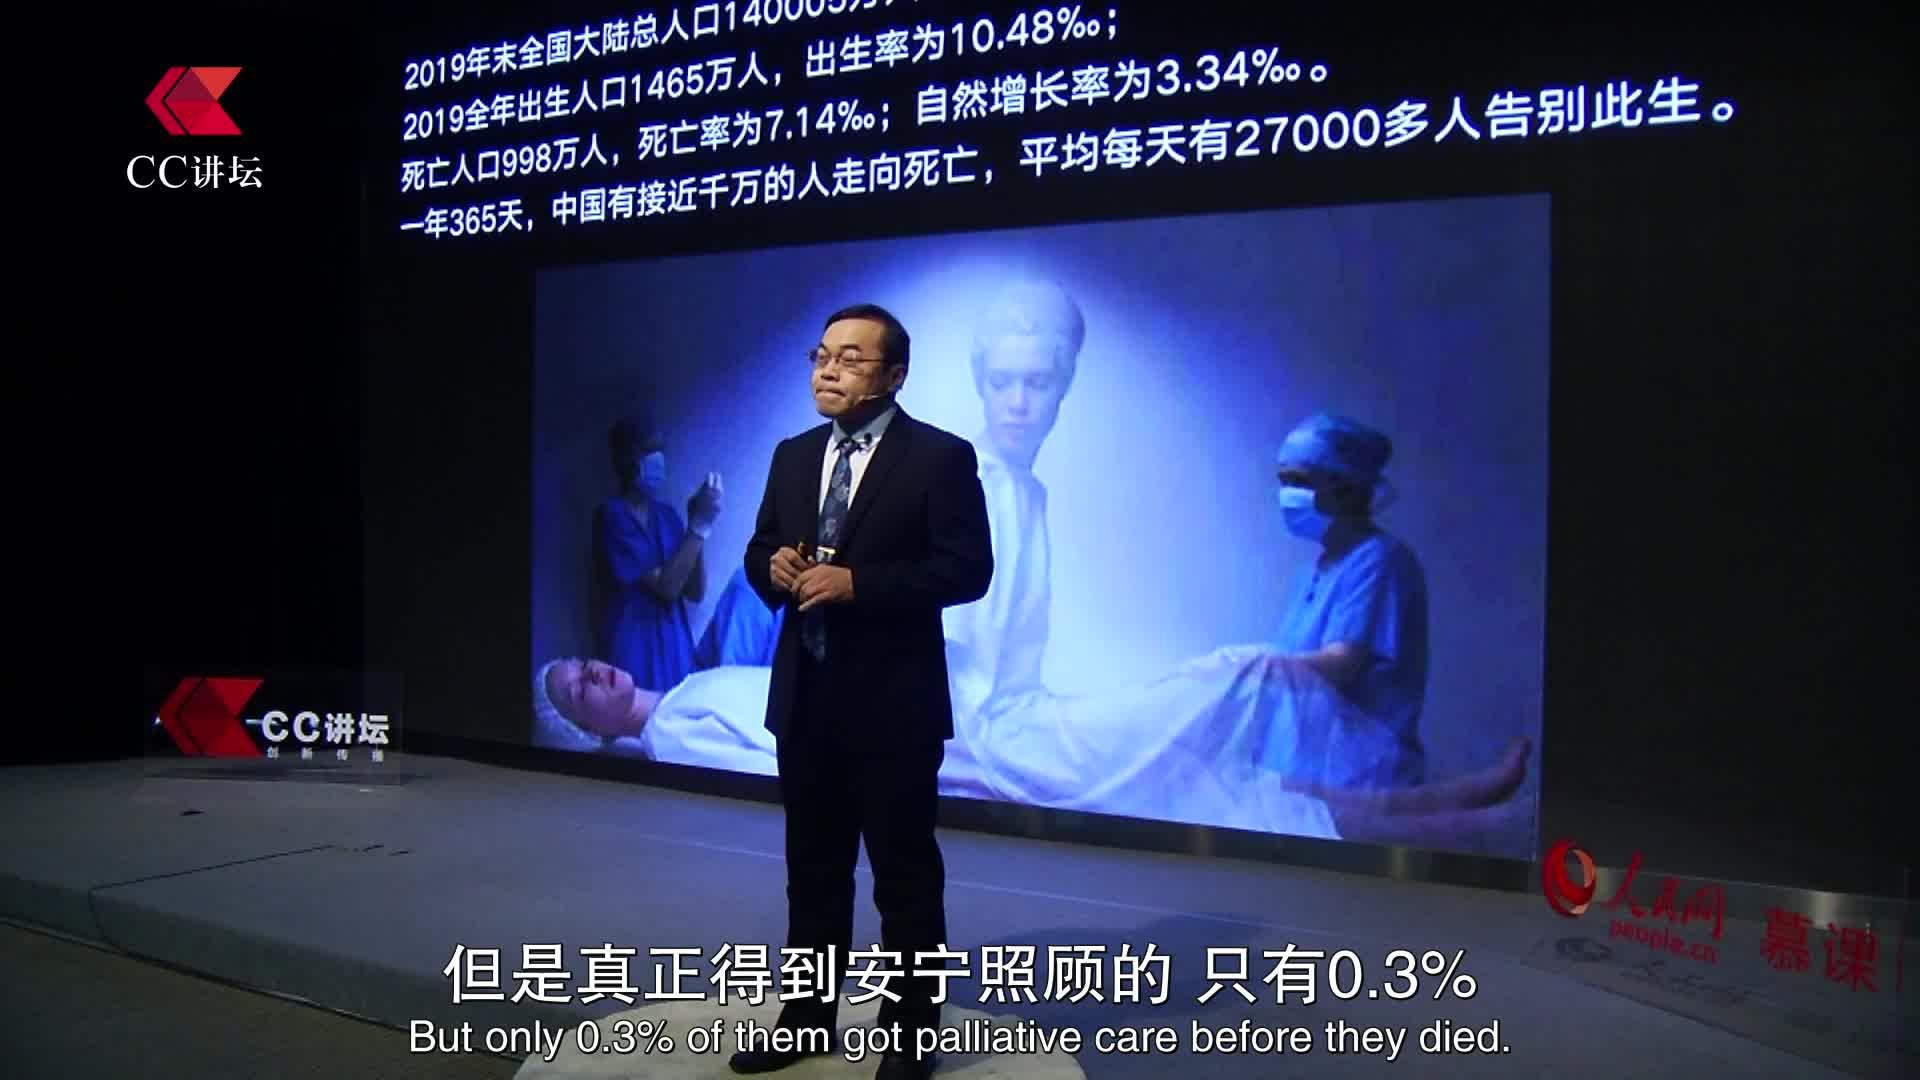 【CC讲坛-公益】路桂军:关于死亡的教育,生命尽头切莫让爱如此纠结